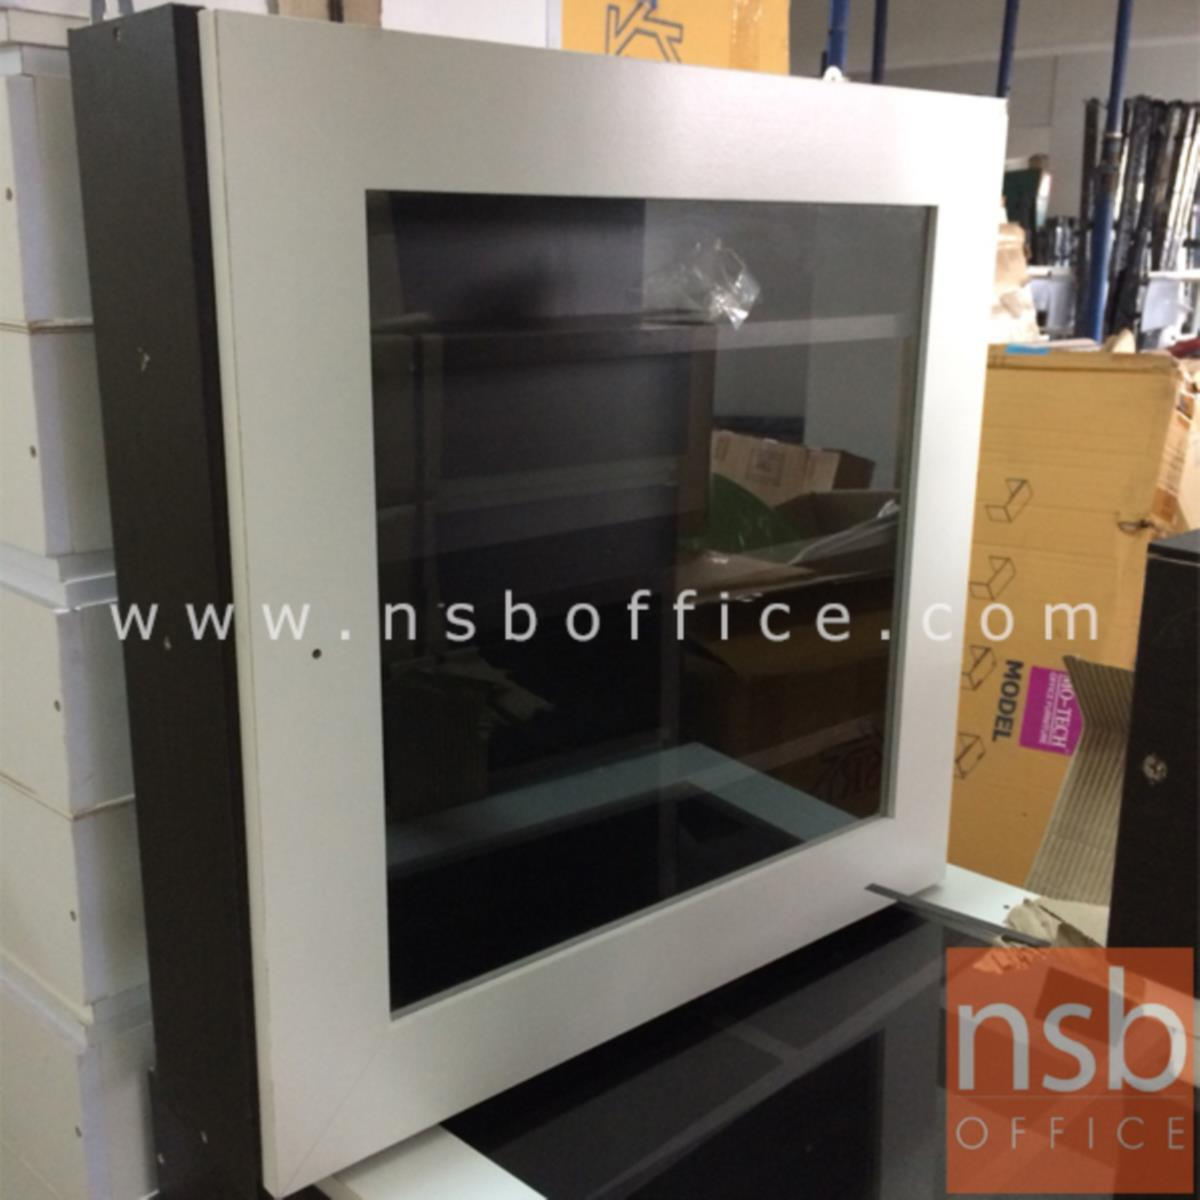 L10A242:ตู้ยาสามัญประจำบ้าน บานเปิดกระจก  หน้าบานสีขาว-โอ๊ค